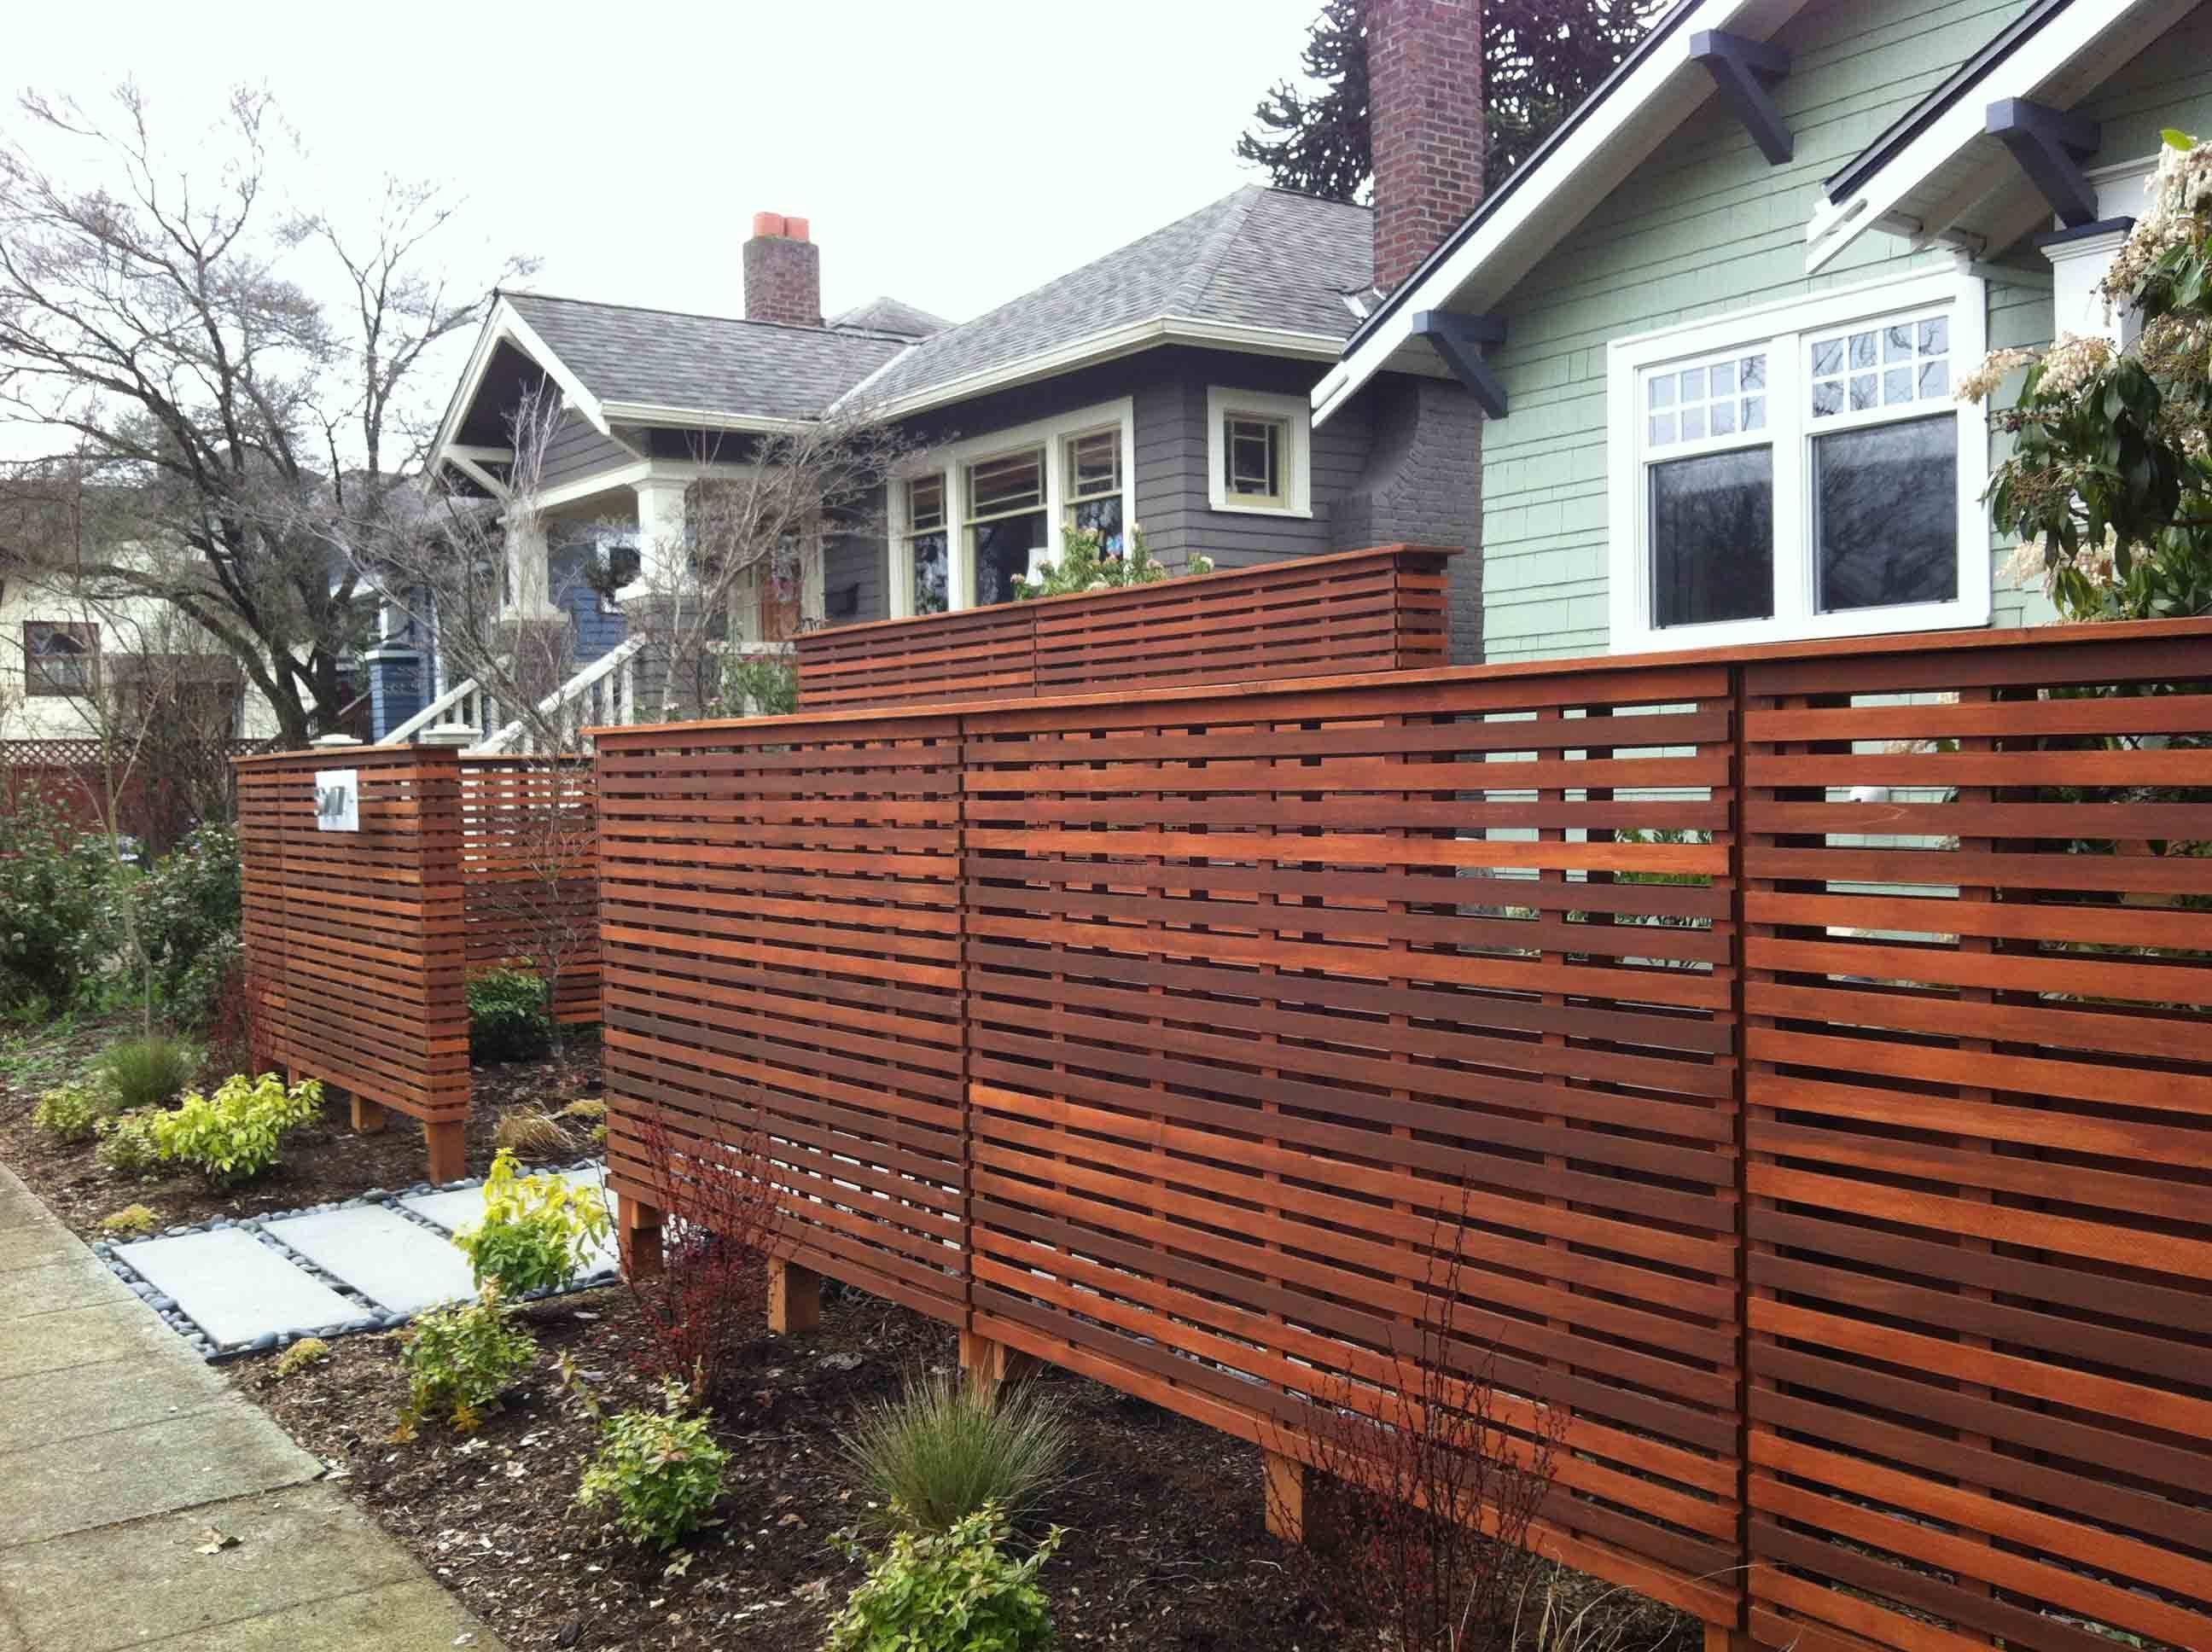 Recinto giardino plastica: plastica giardino recinto reticolo ...